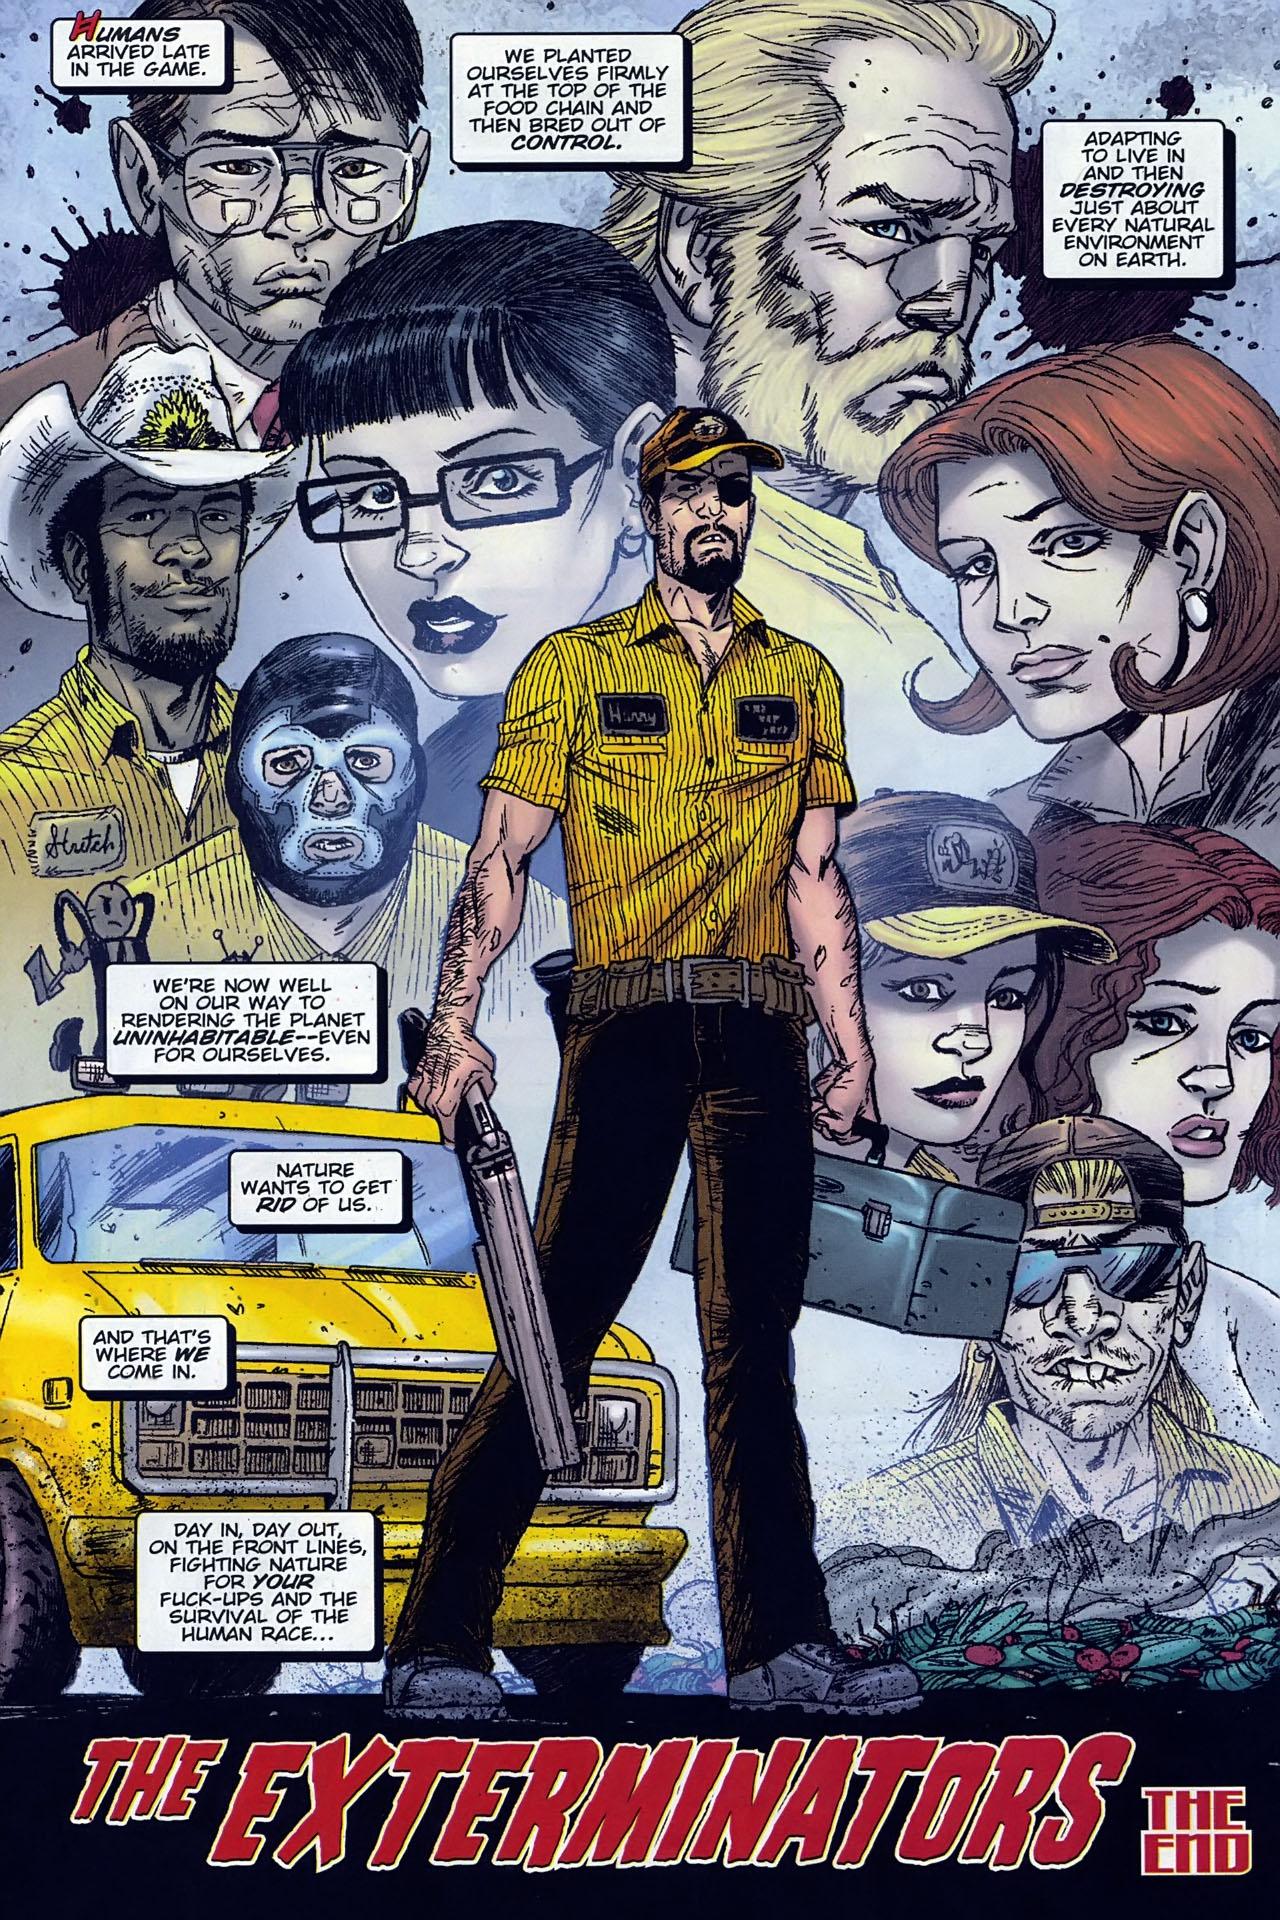 Read online The Exterminators comic -  Issue #30 - 24